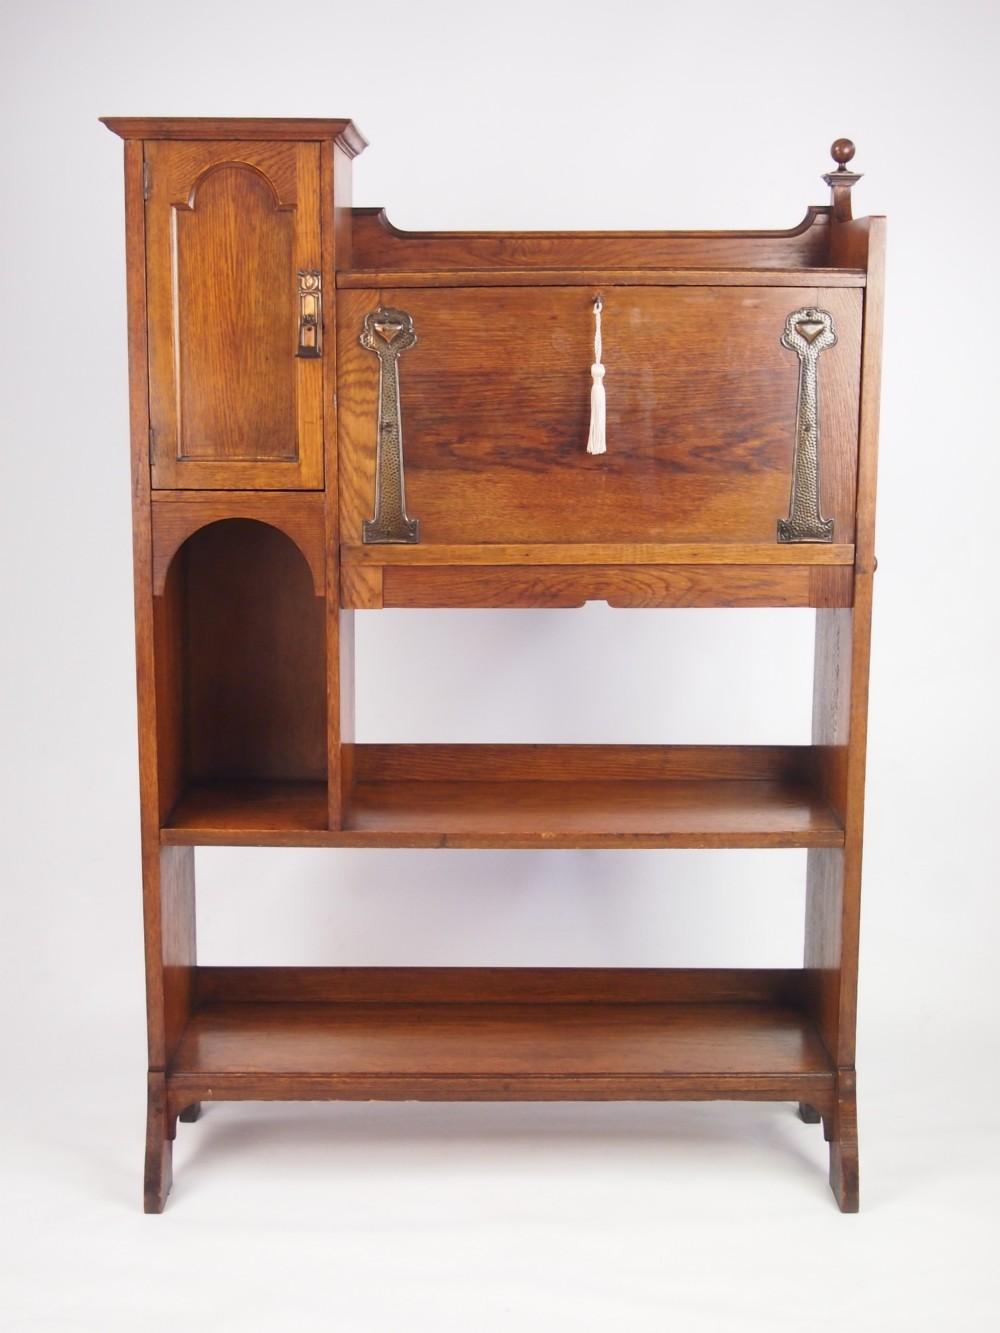 antique arts and crafts oak hall bureau bookcase 267727. Black Bedroom Furniture Sets. Home Design Ideas